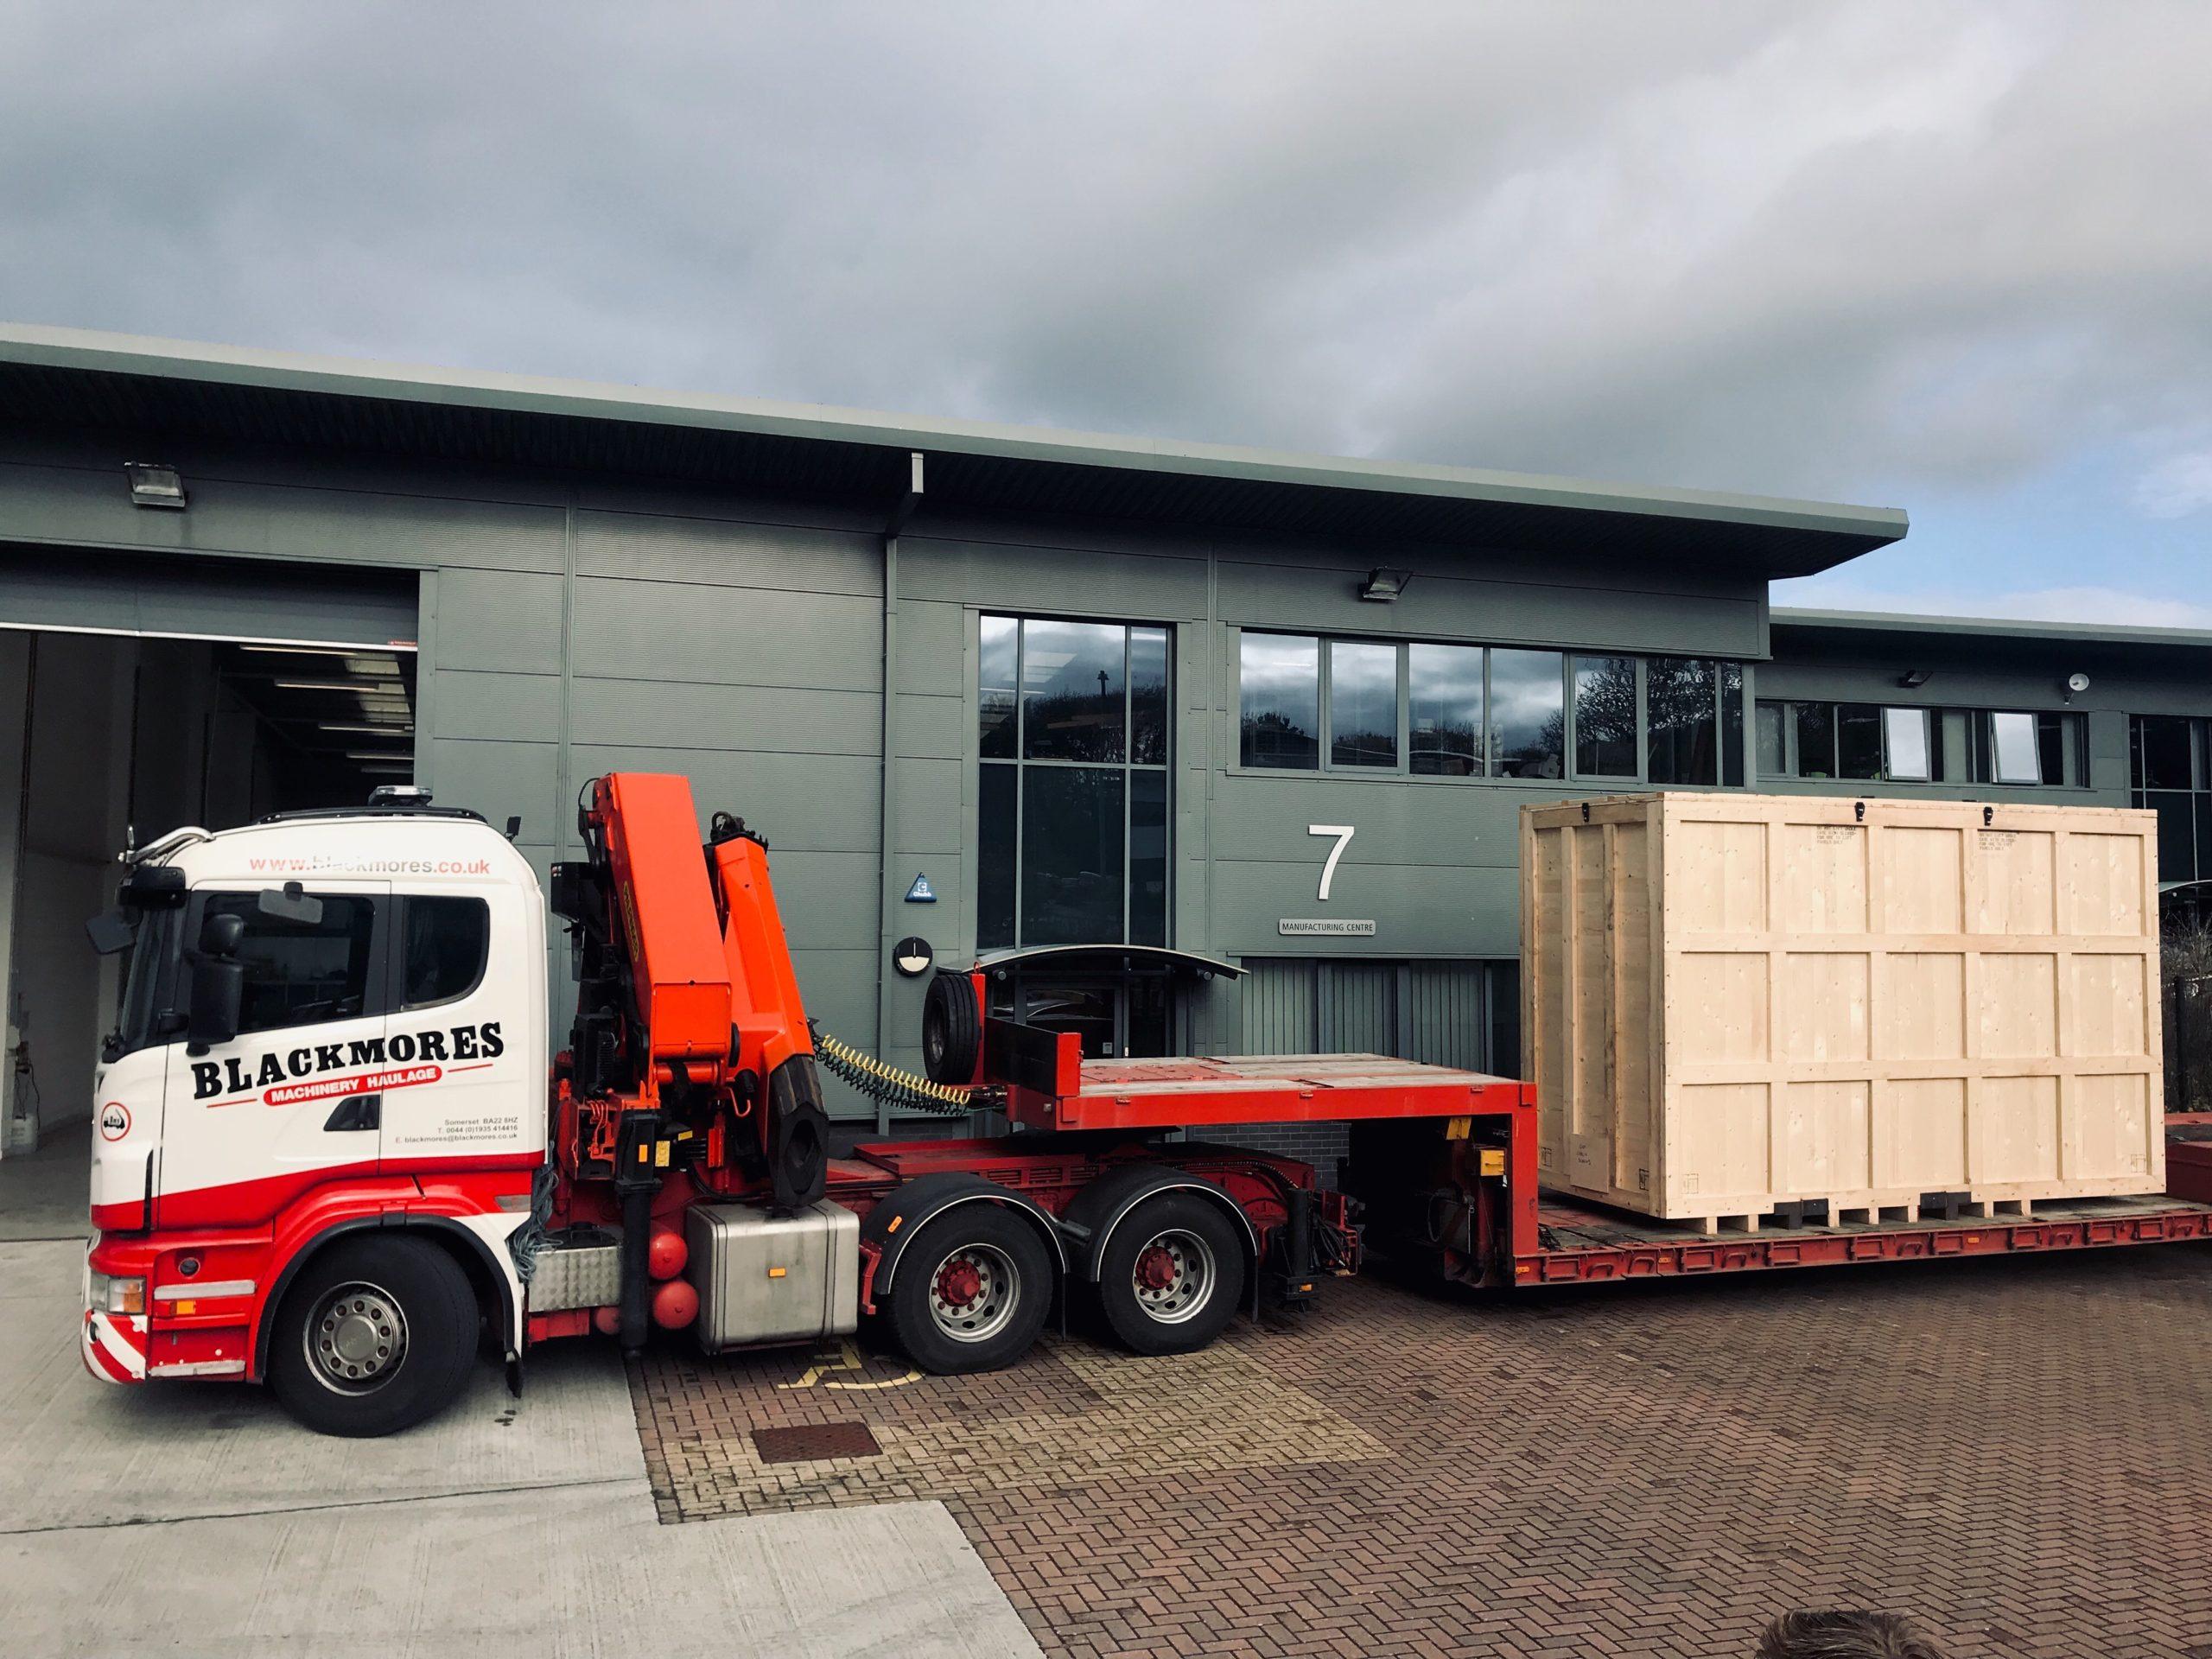 Blackmores Trucks with heavy goods